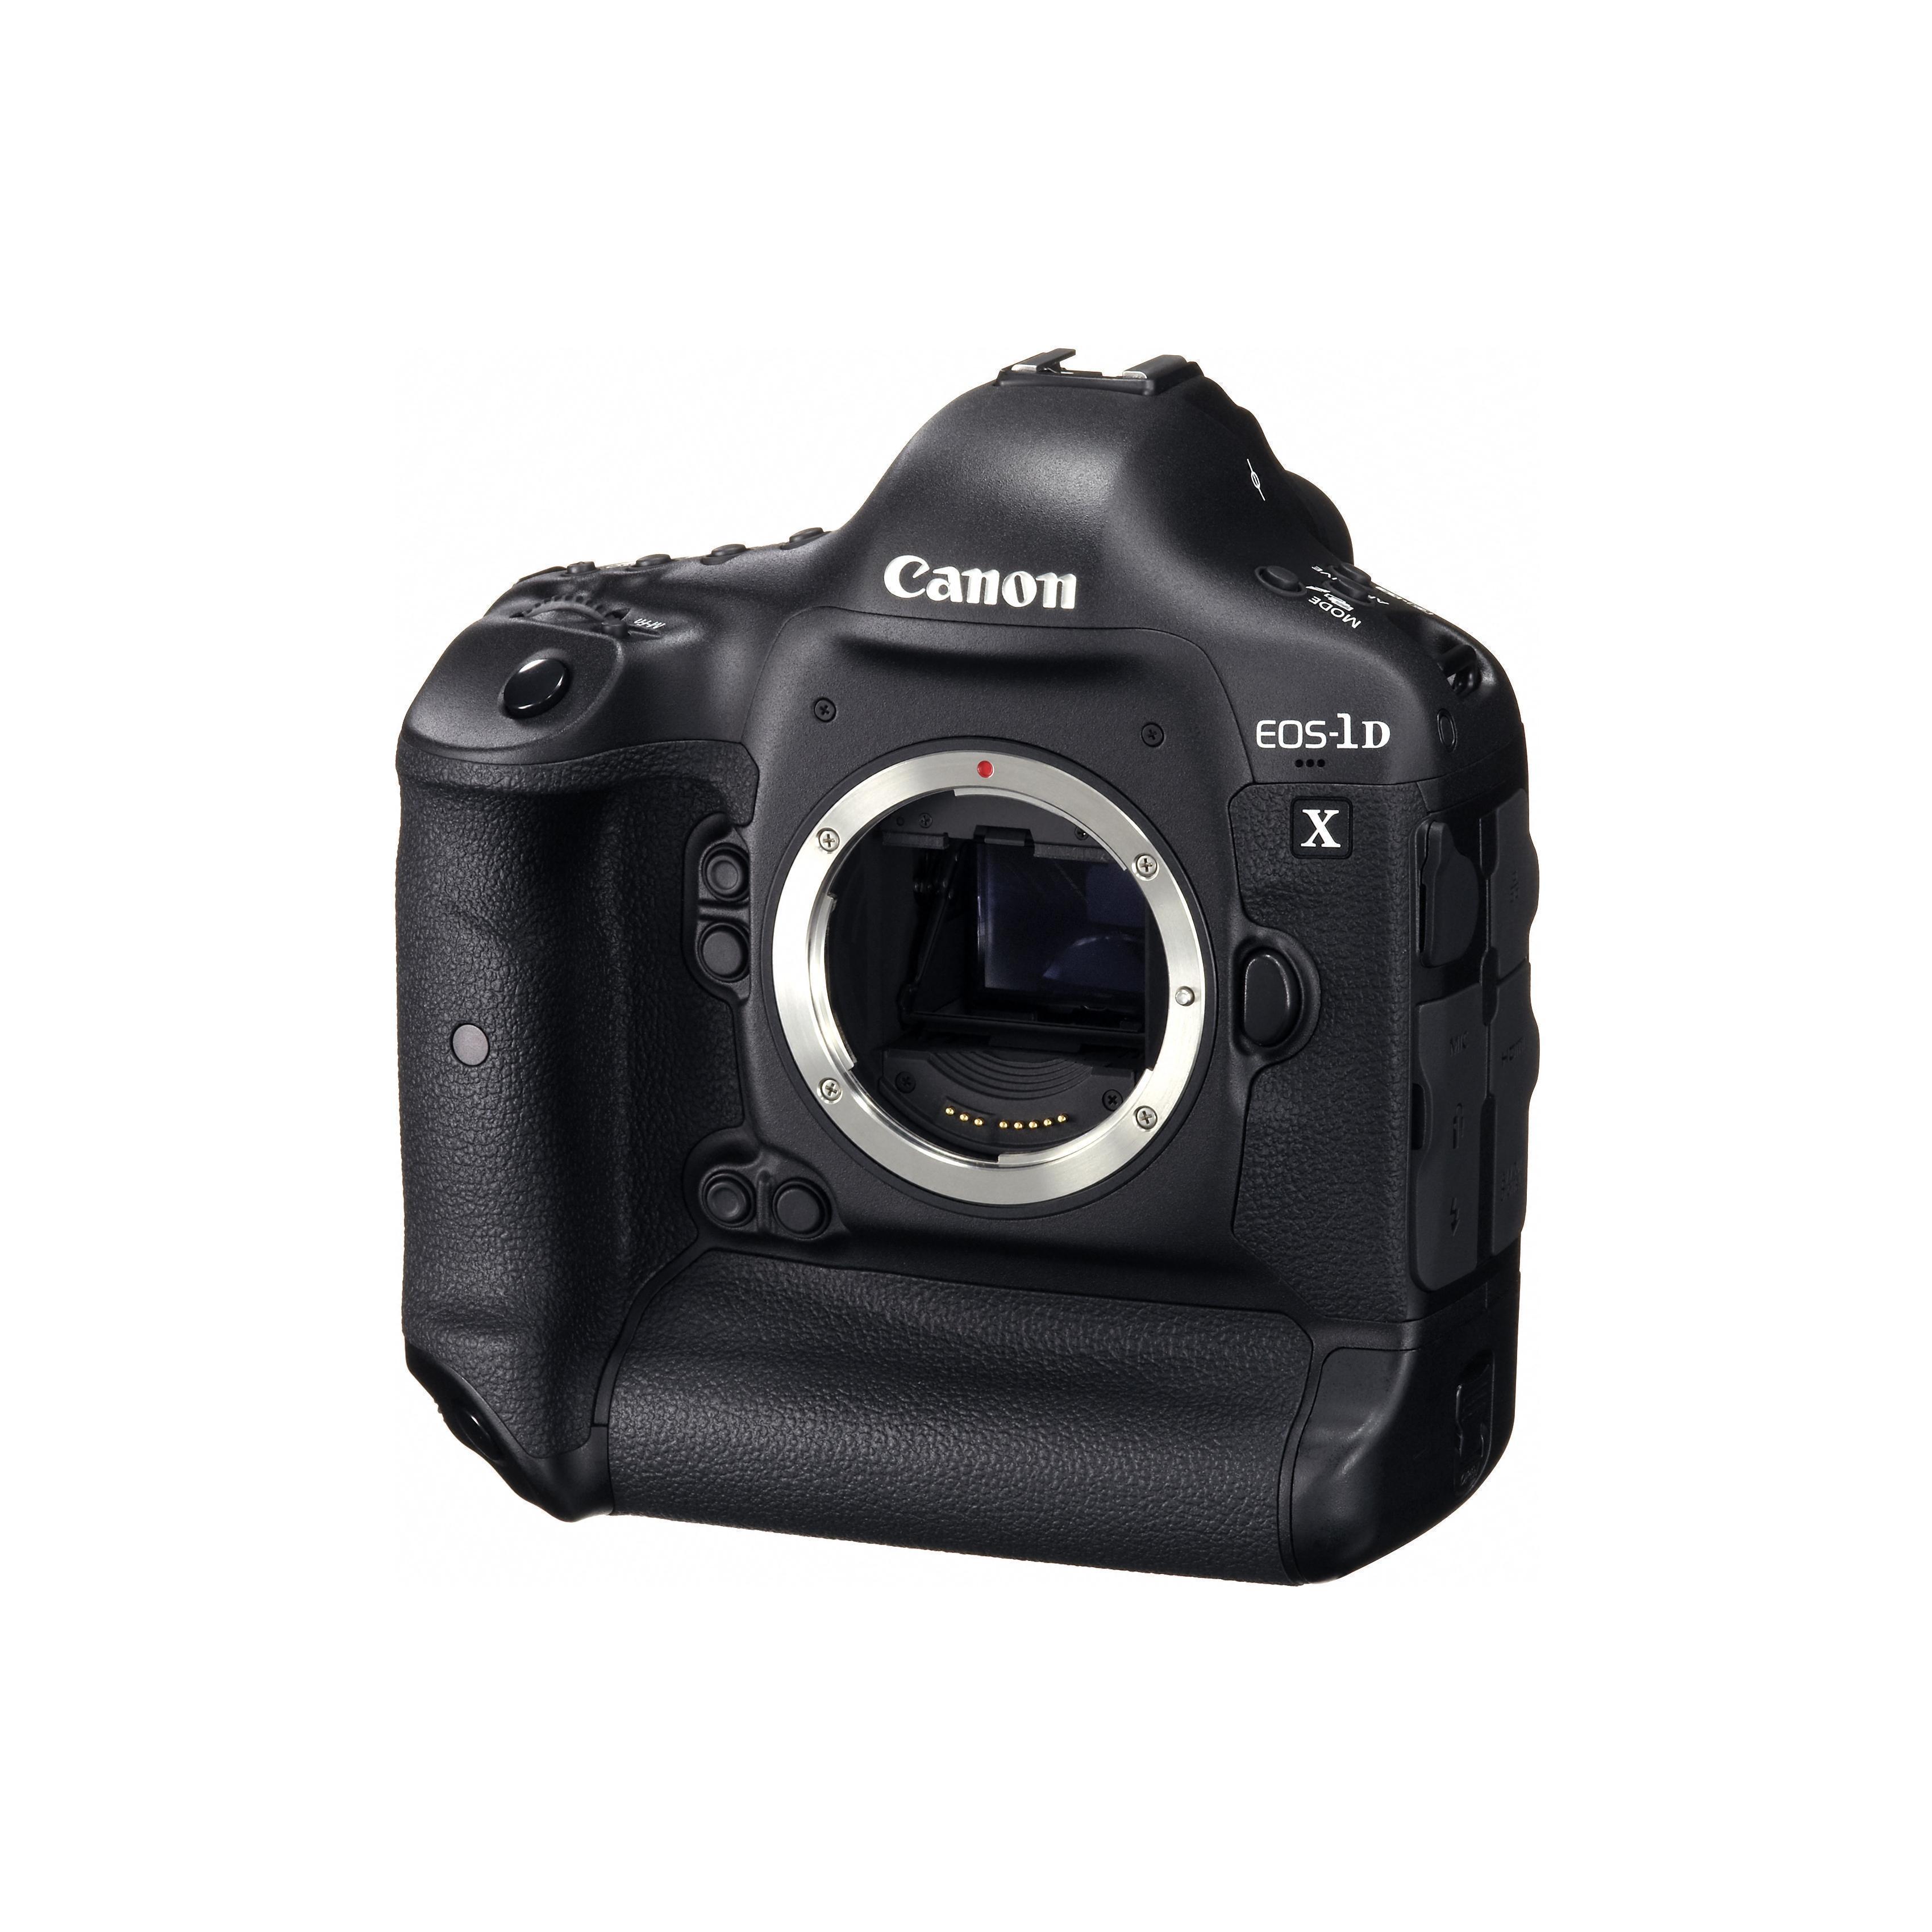 Reflex Canon EOS-1D X Vain Vartalo - Musta